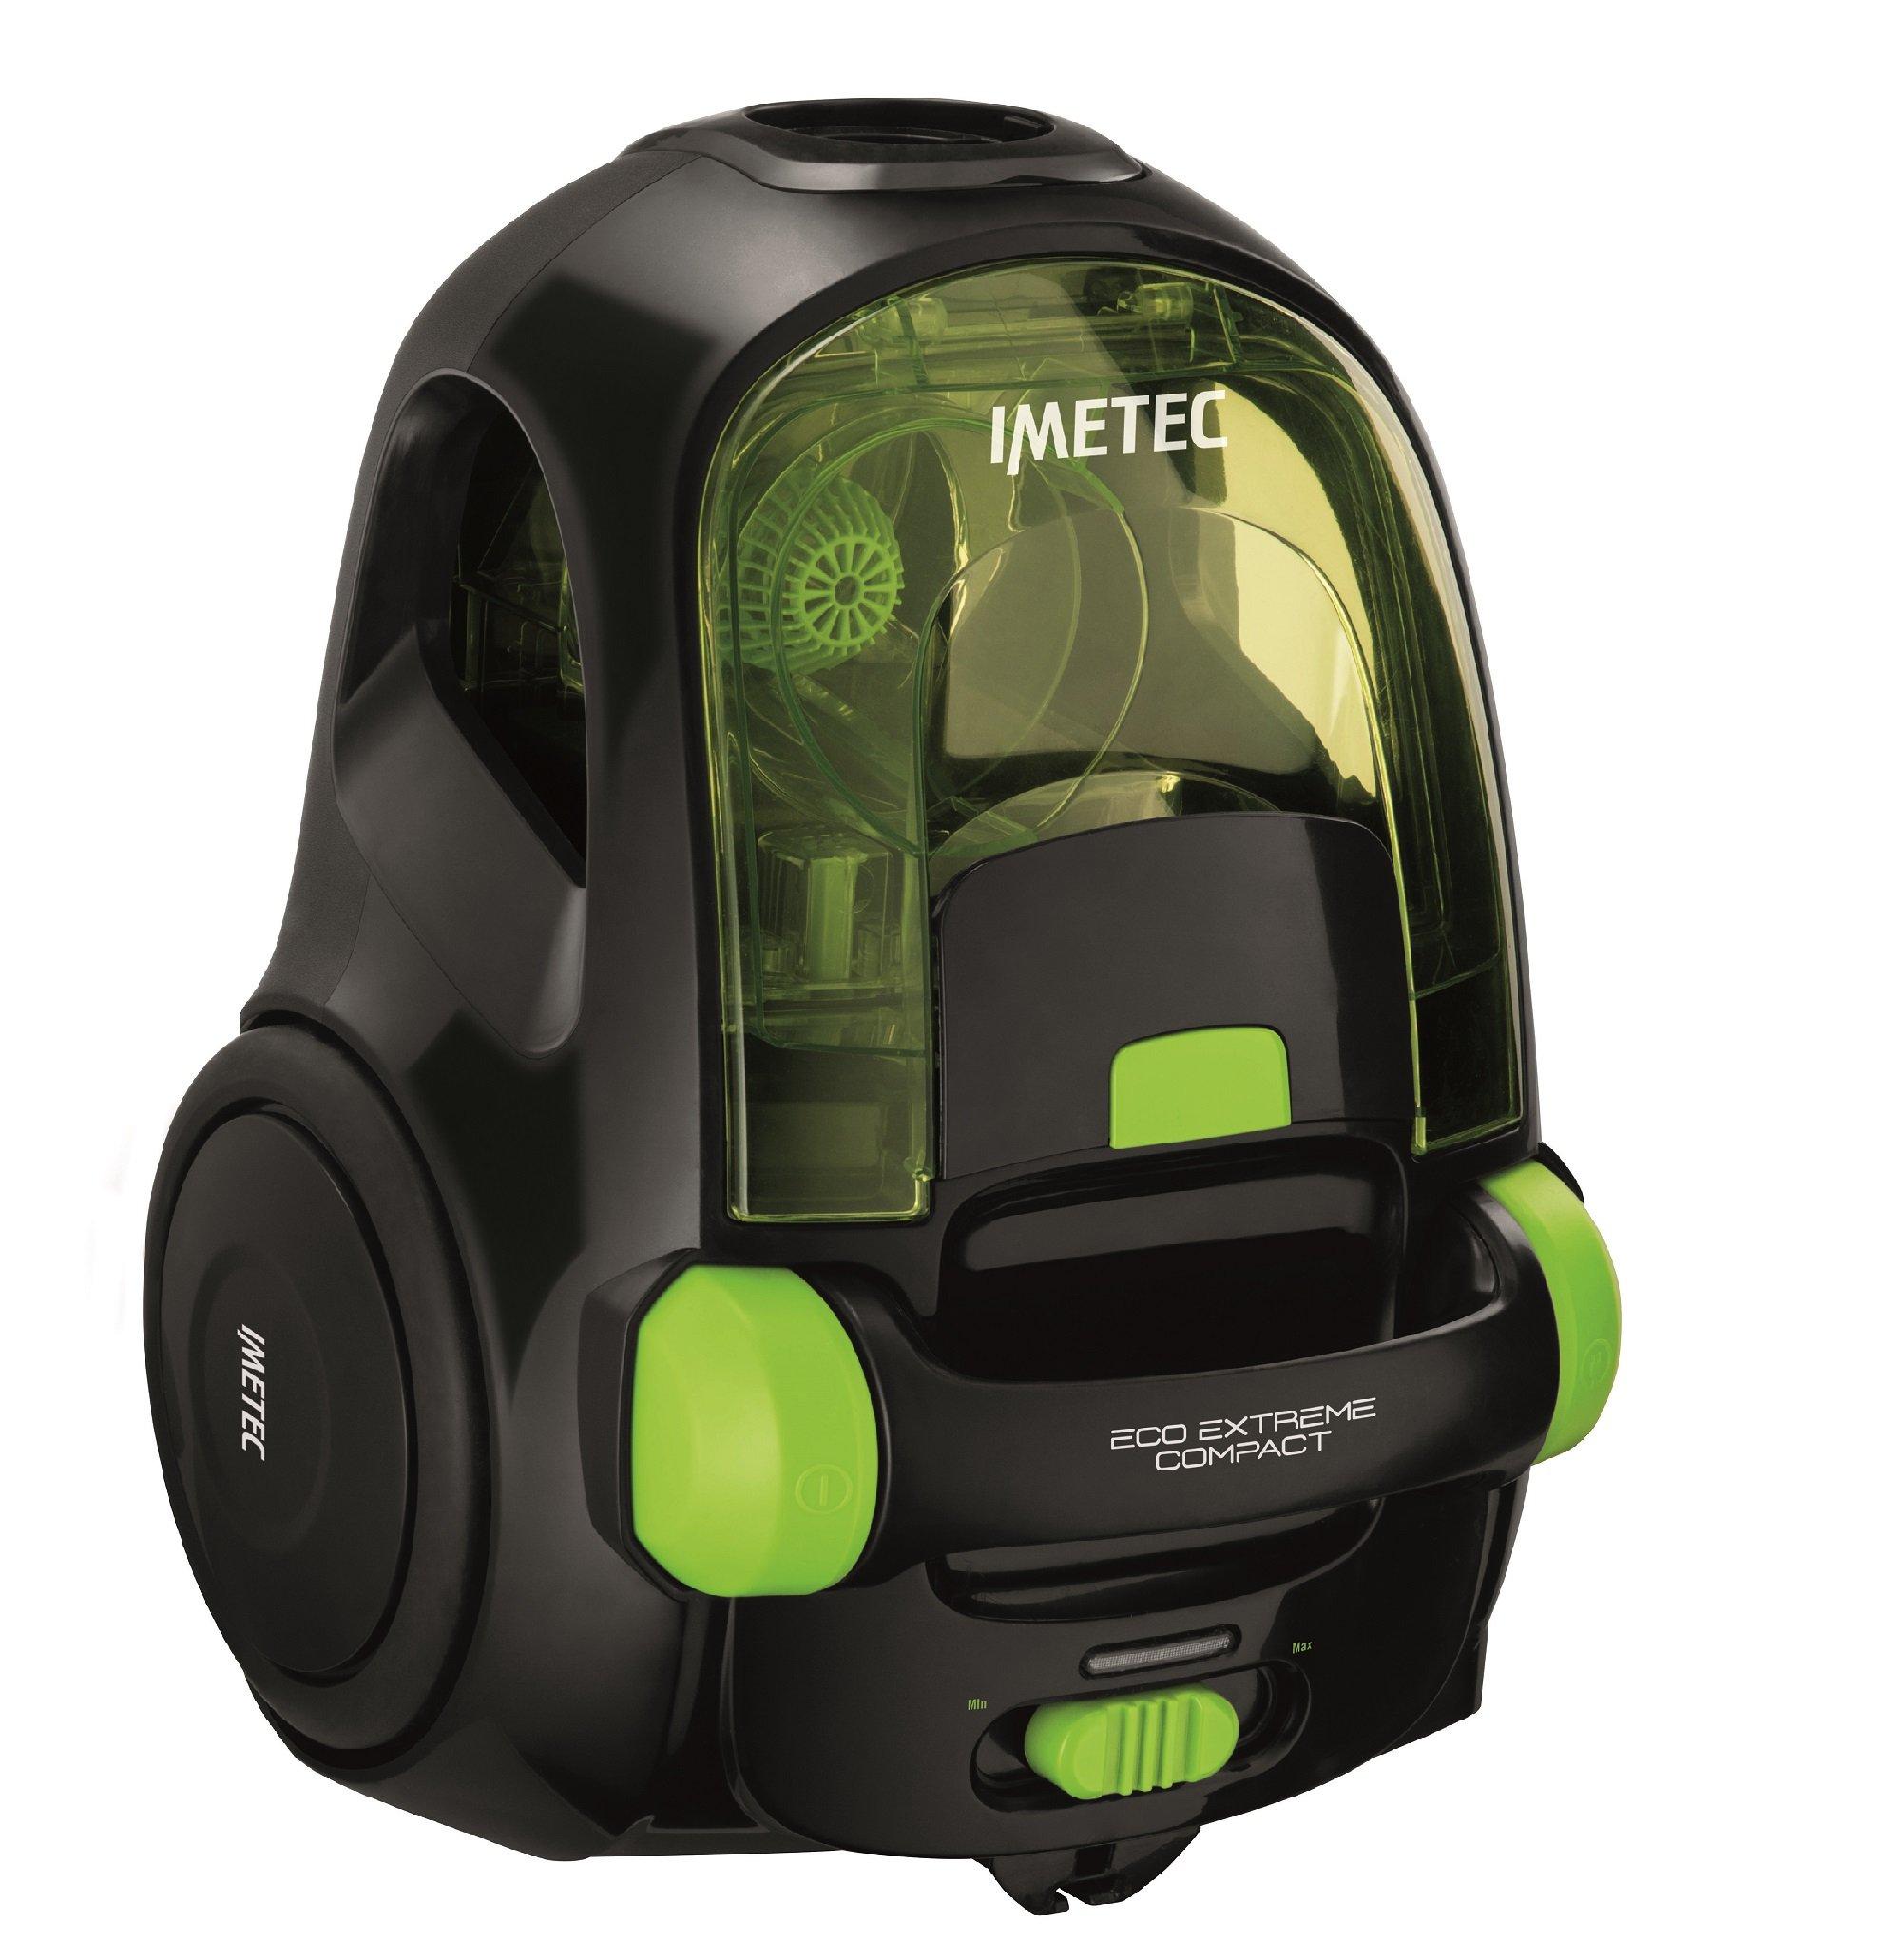 Imetec Eco Extreme Compact Aspirapolvere product image